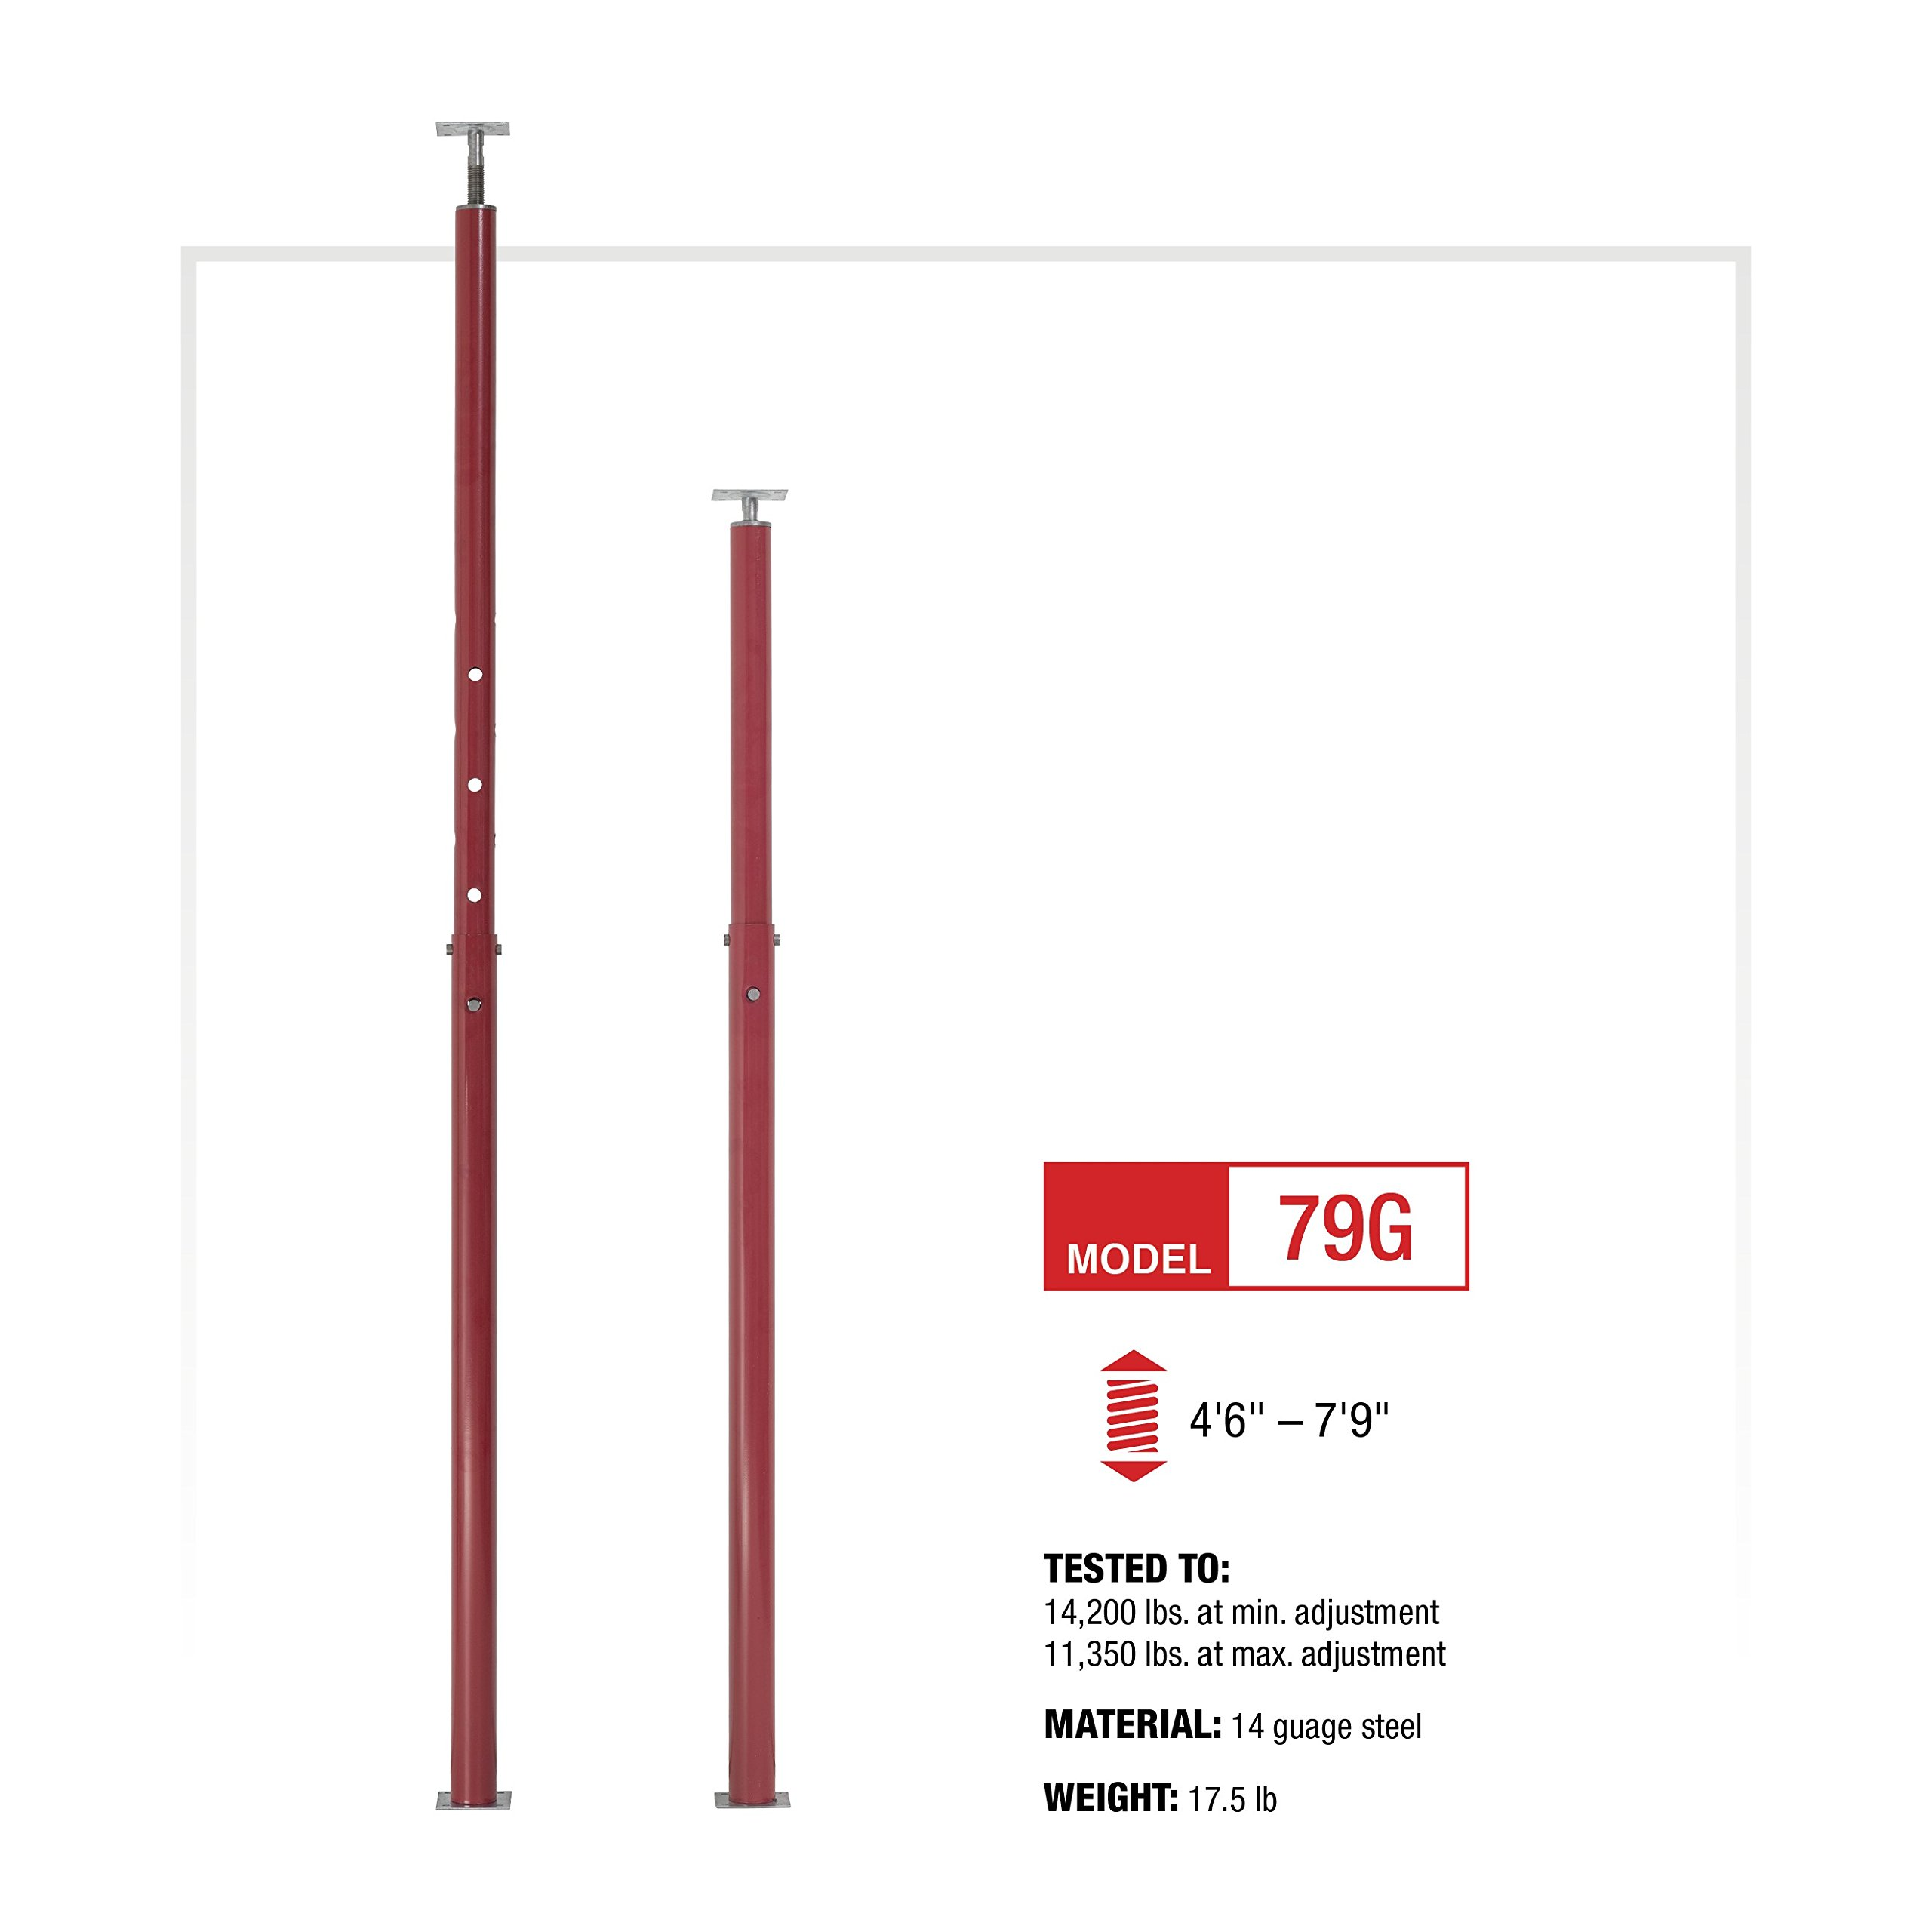 Grow Co. Adjustable Floor Jack - 14,200-Lb. Capacity, Model# 79G